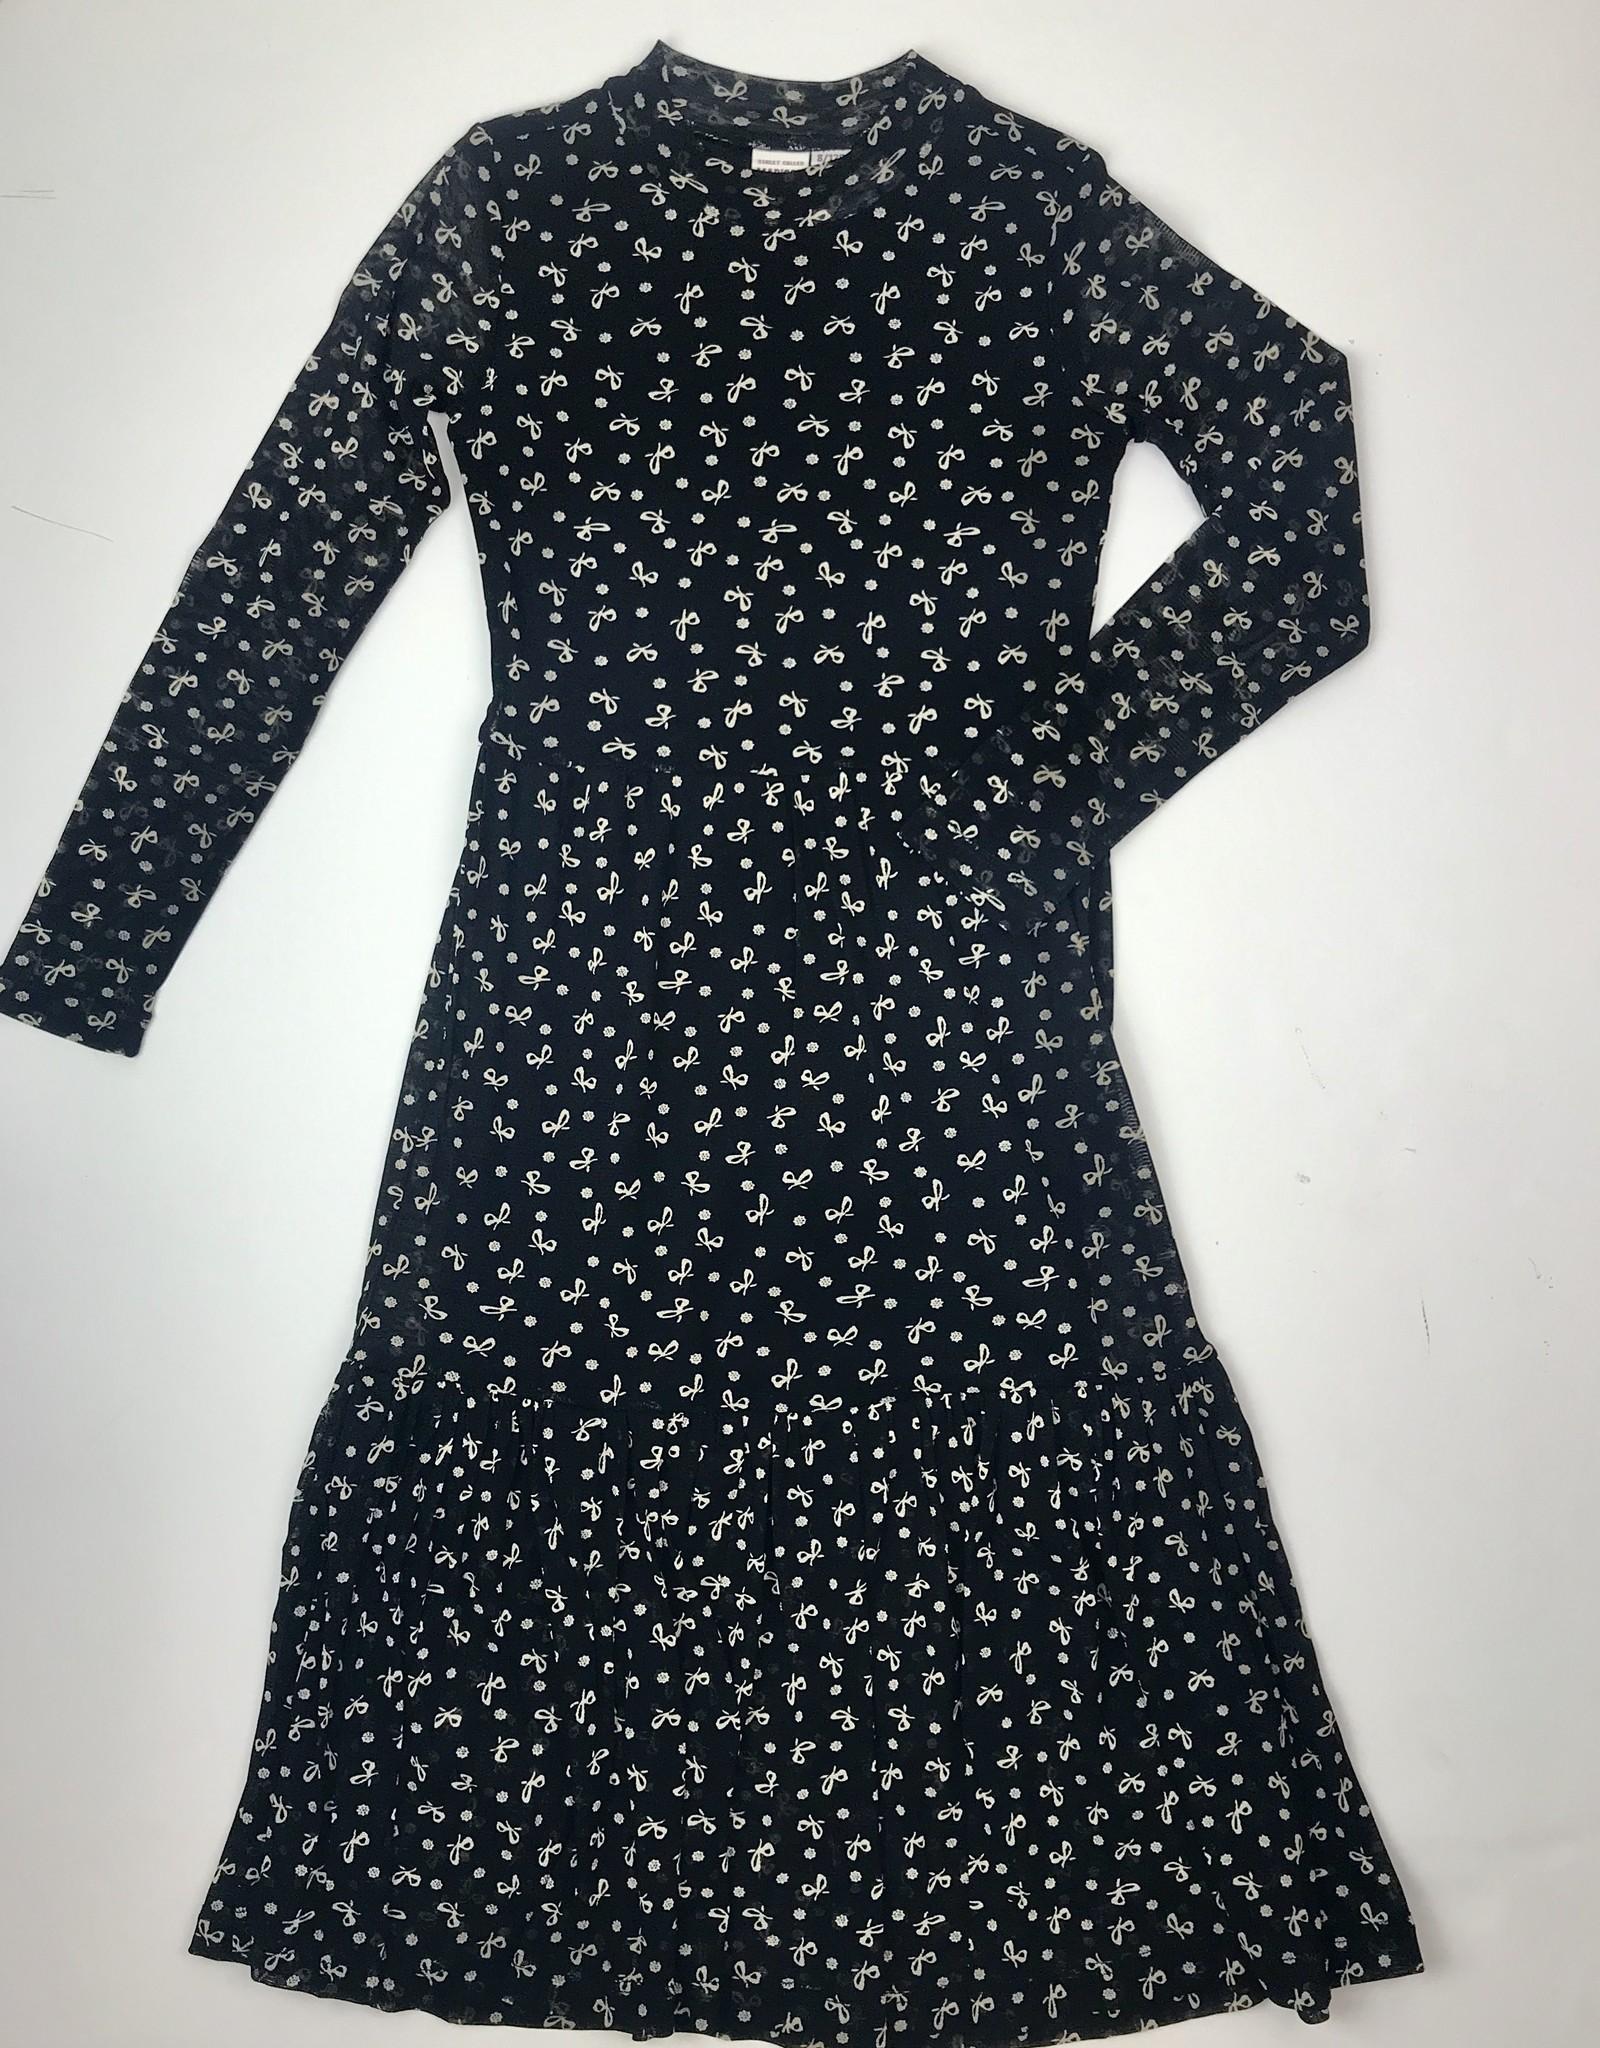 Madison Big Girls Black Bow Print Mesh Maxi Dress 5